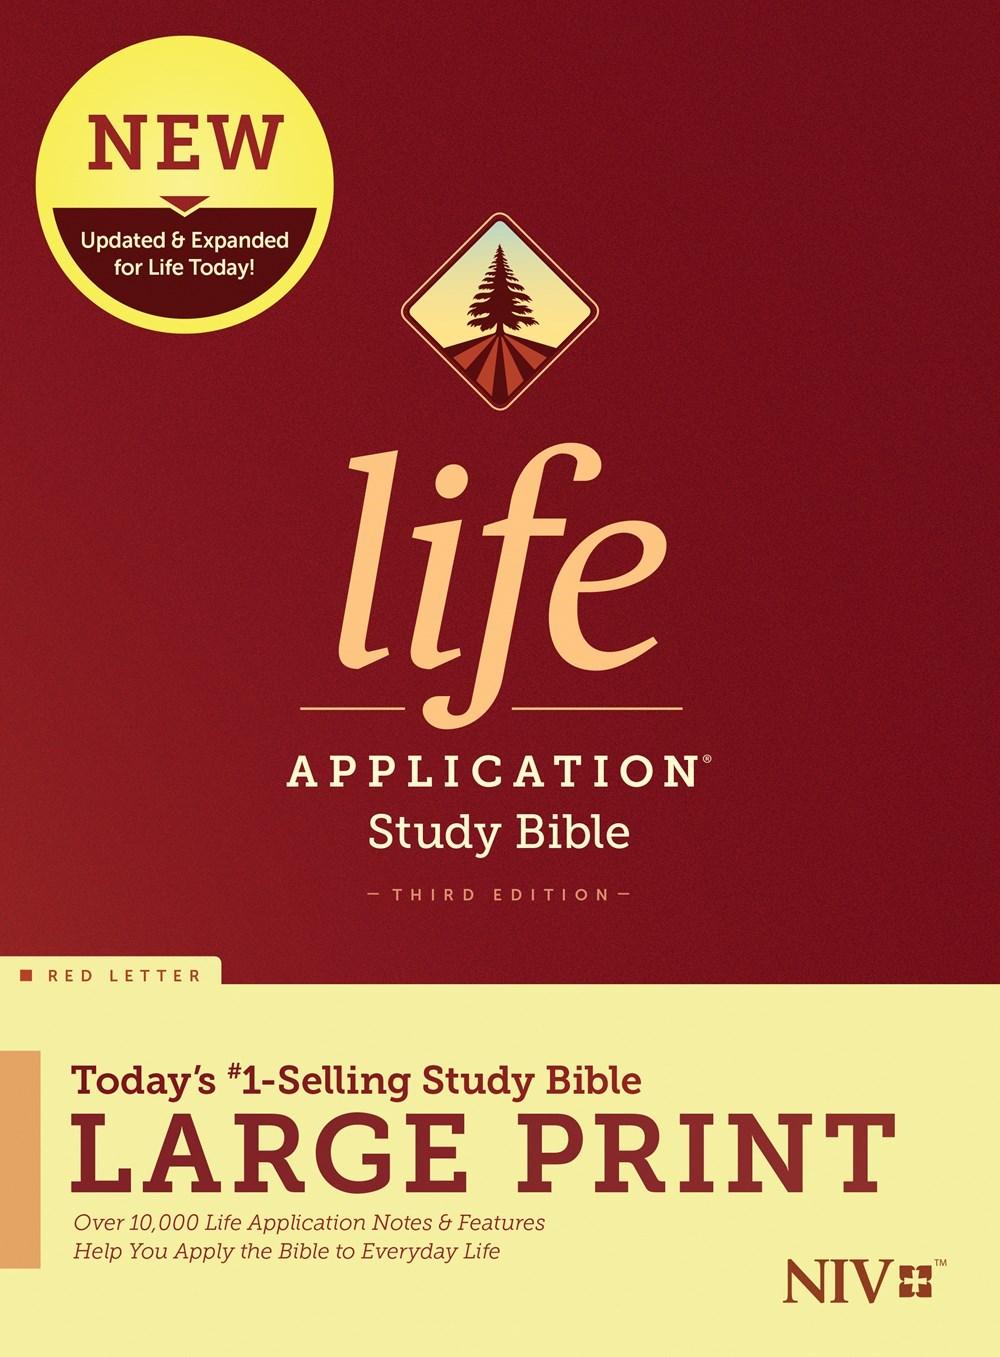 NIV Life Application Study Bible/Large Print (Third Edition) (RL)-Hardcover